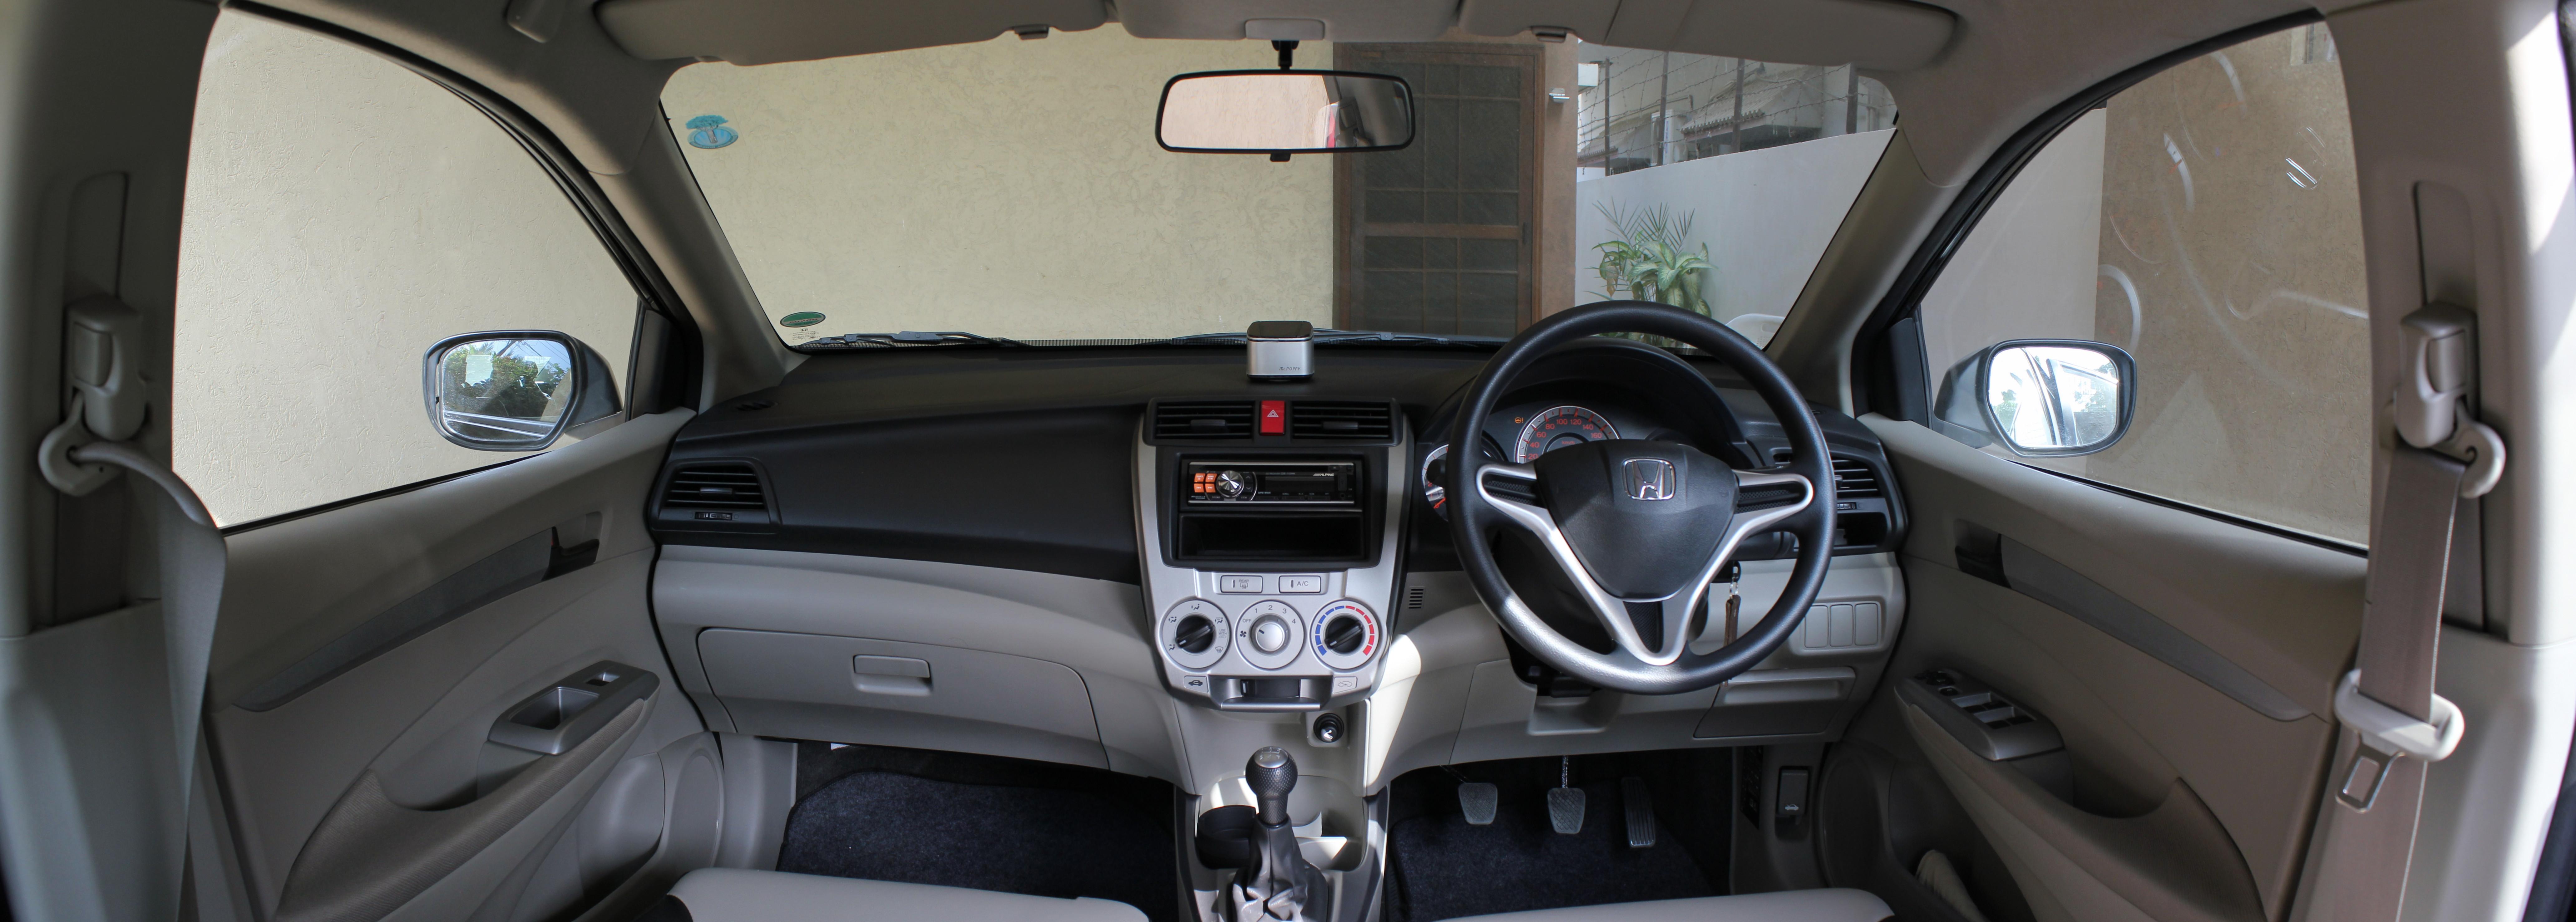 Honda Cars Pakistan Price List